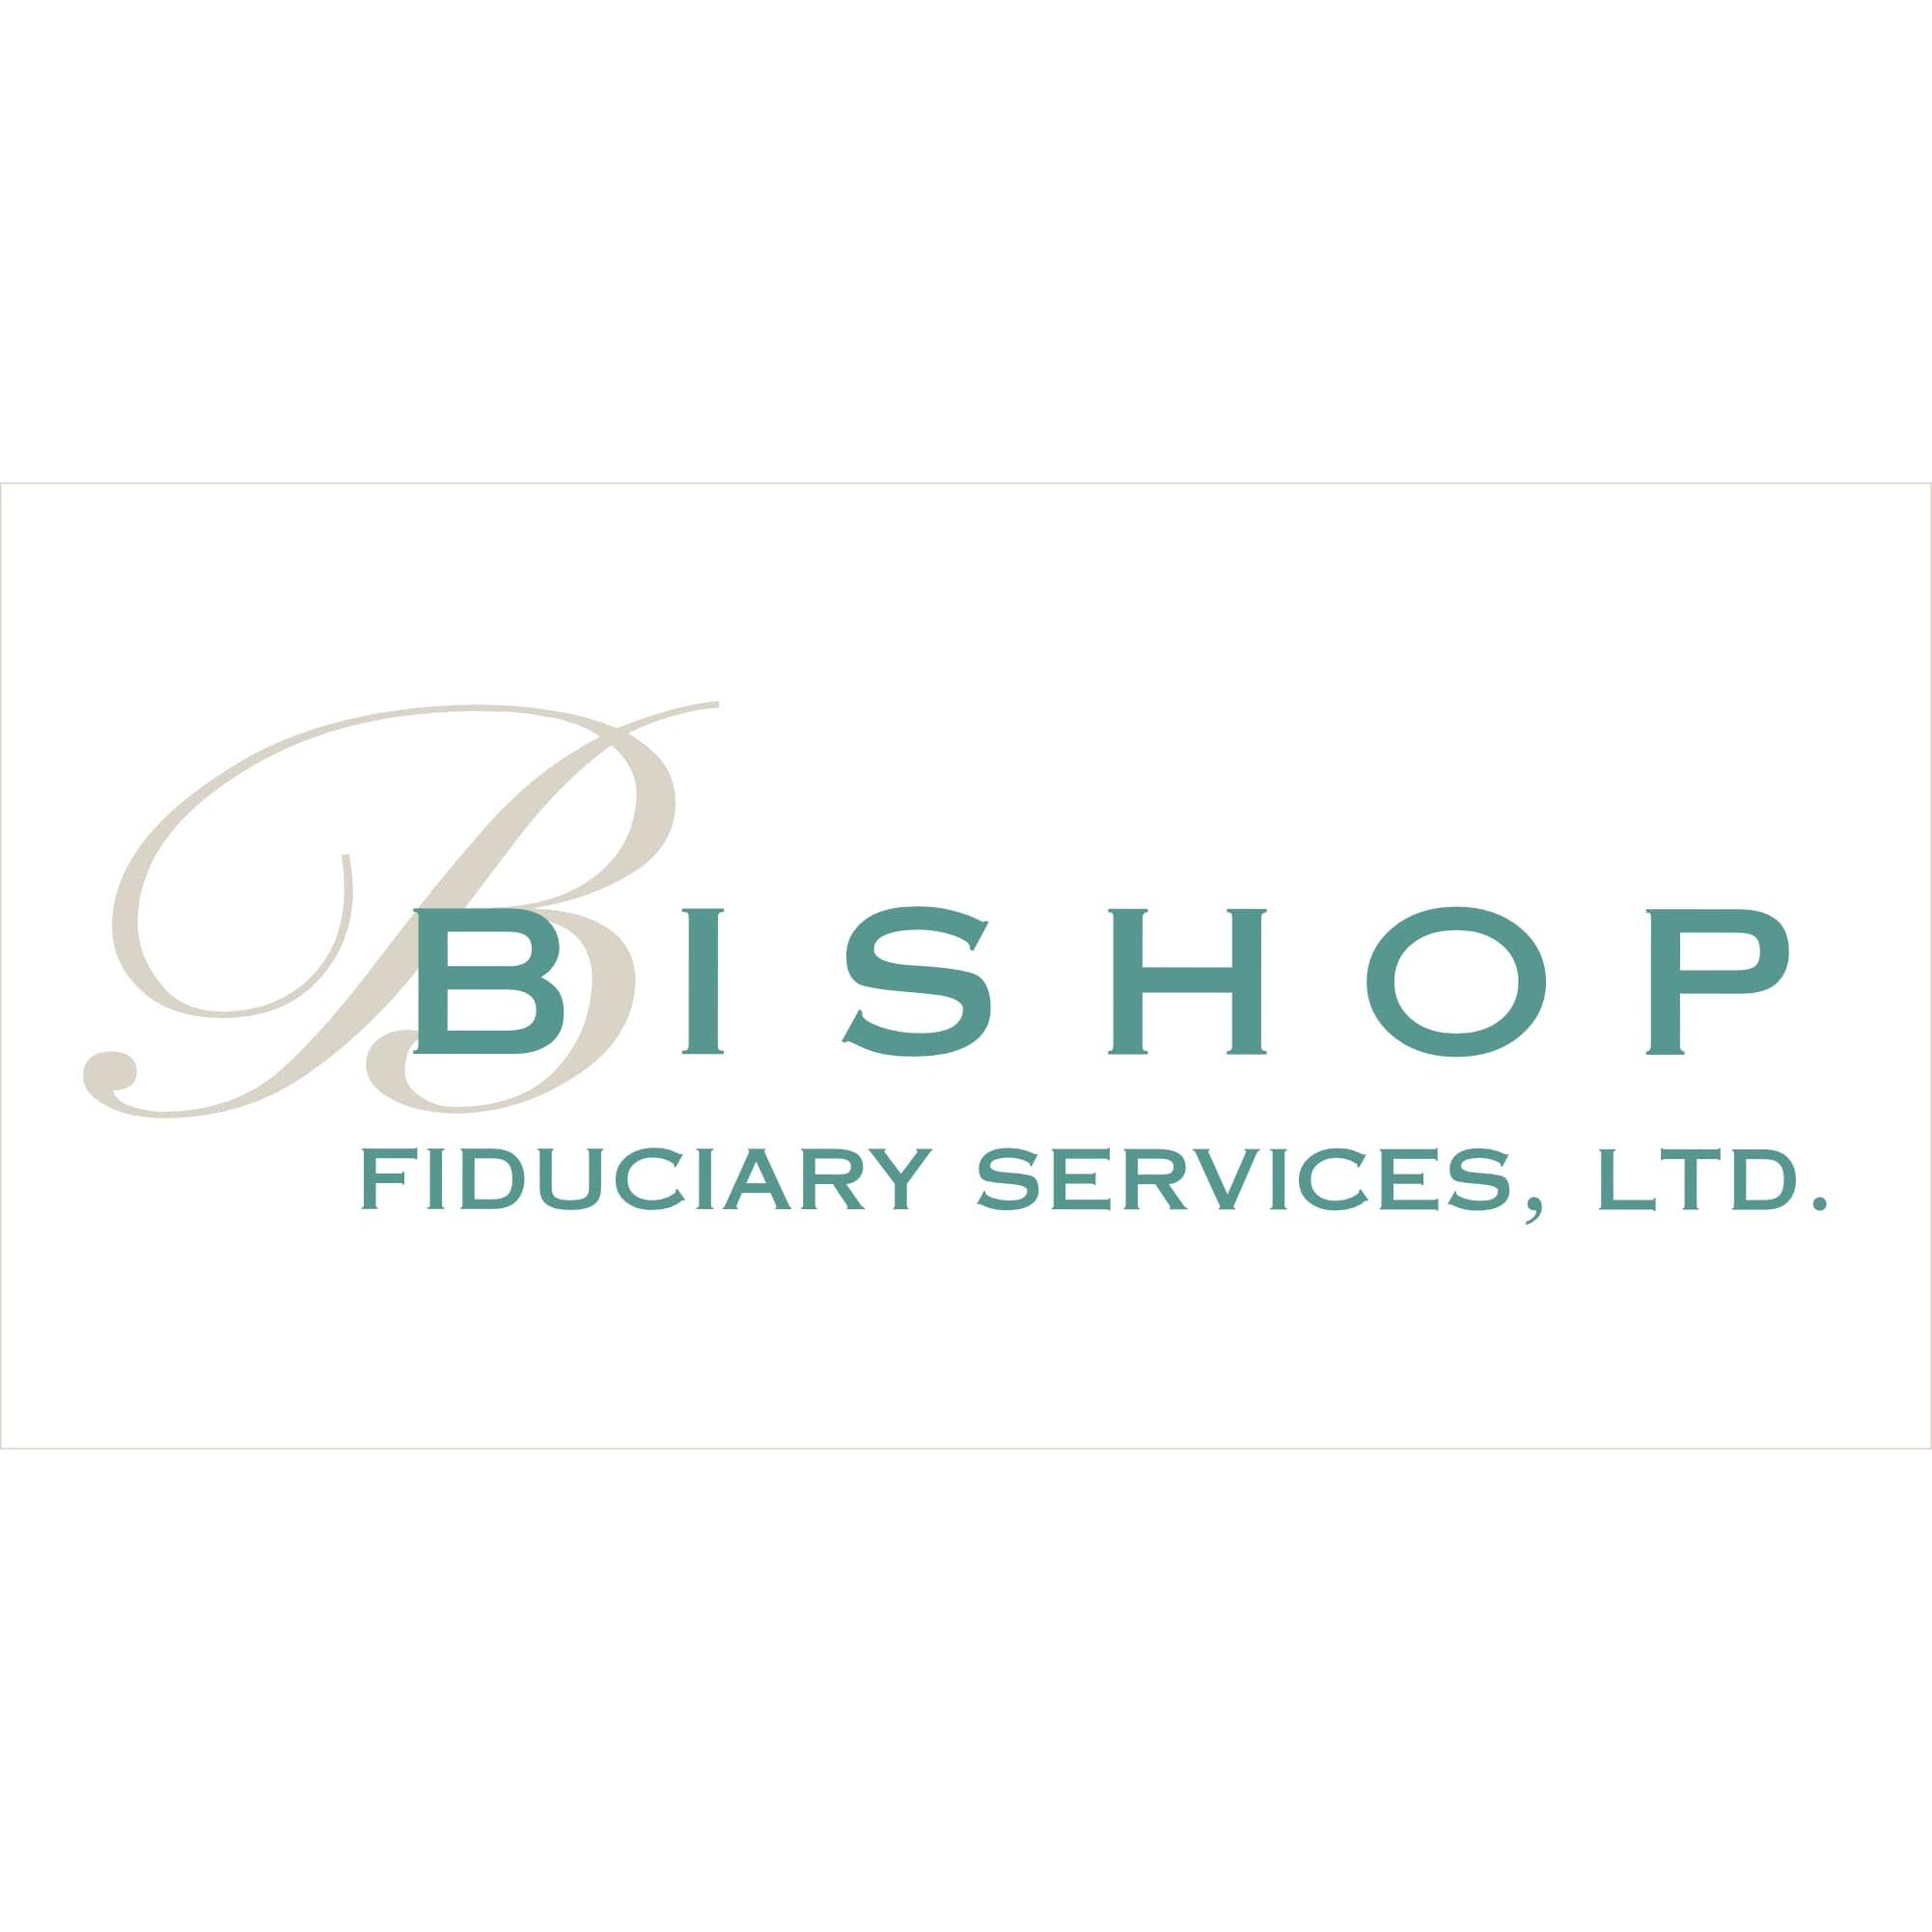 Bishop Fiduciary Services Ltd. image 0